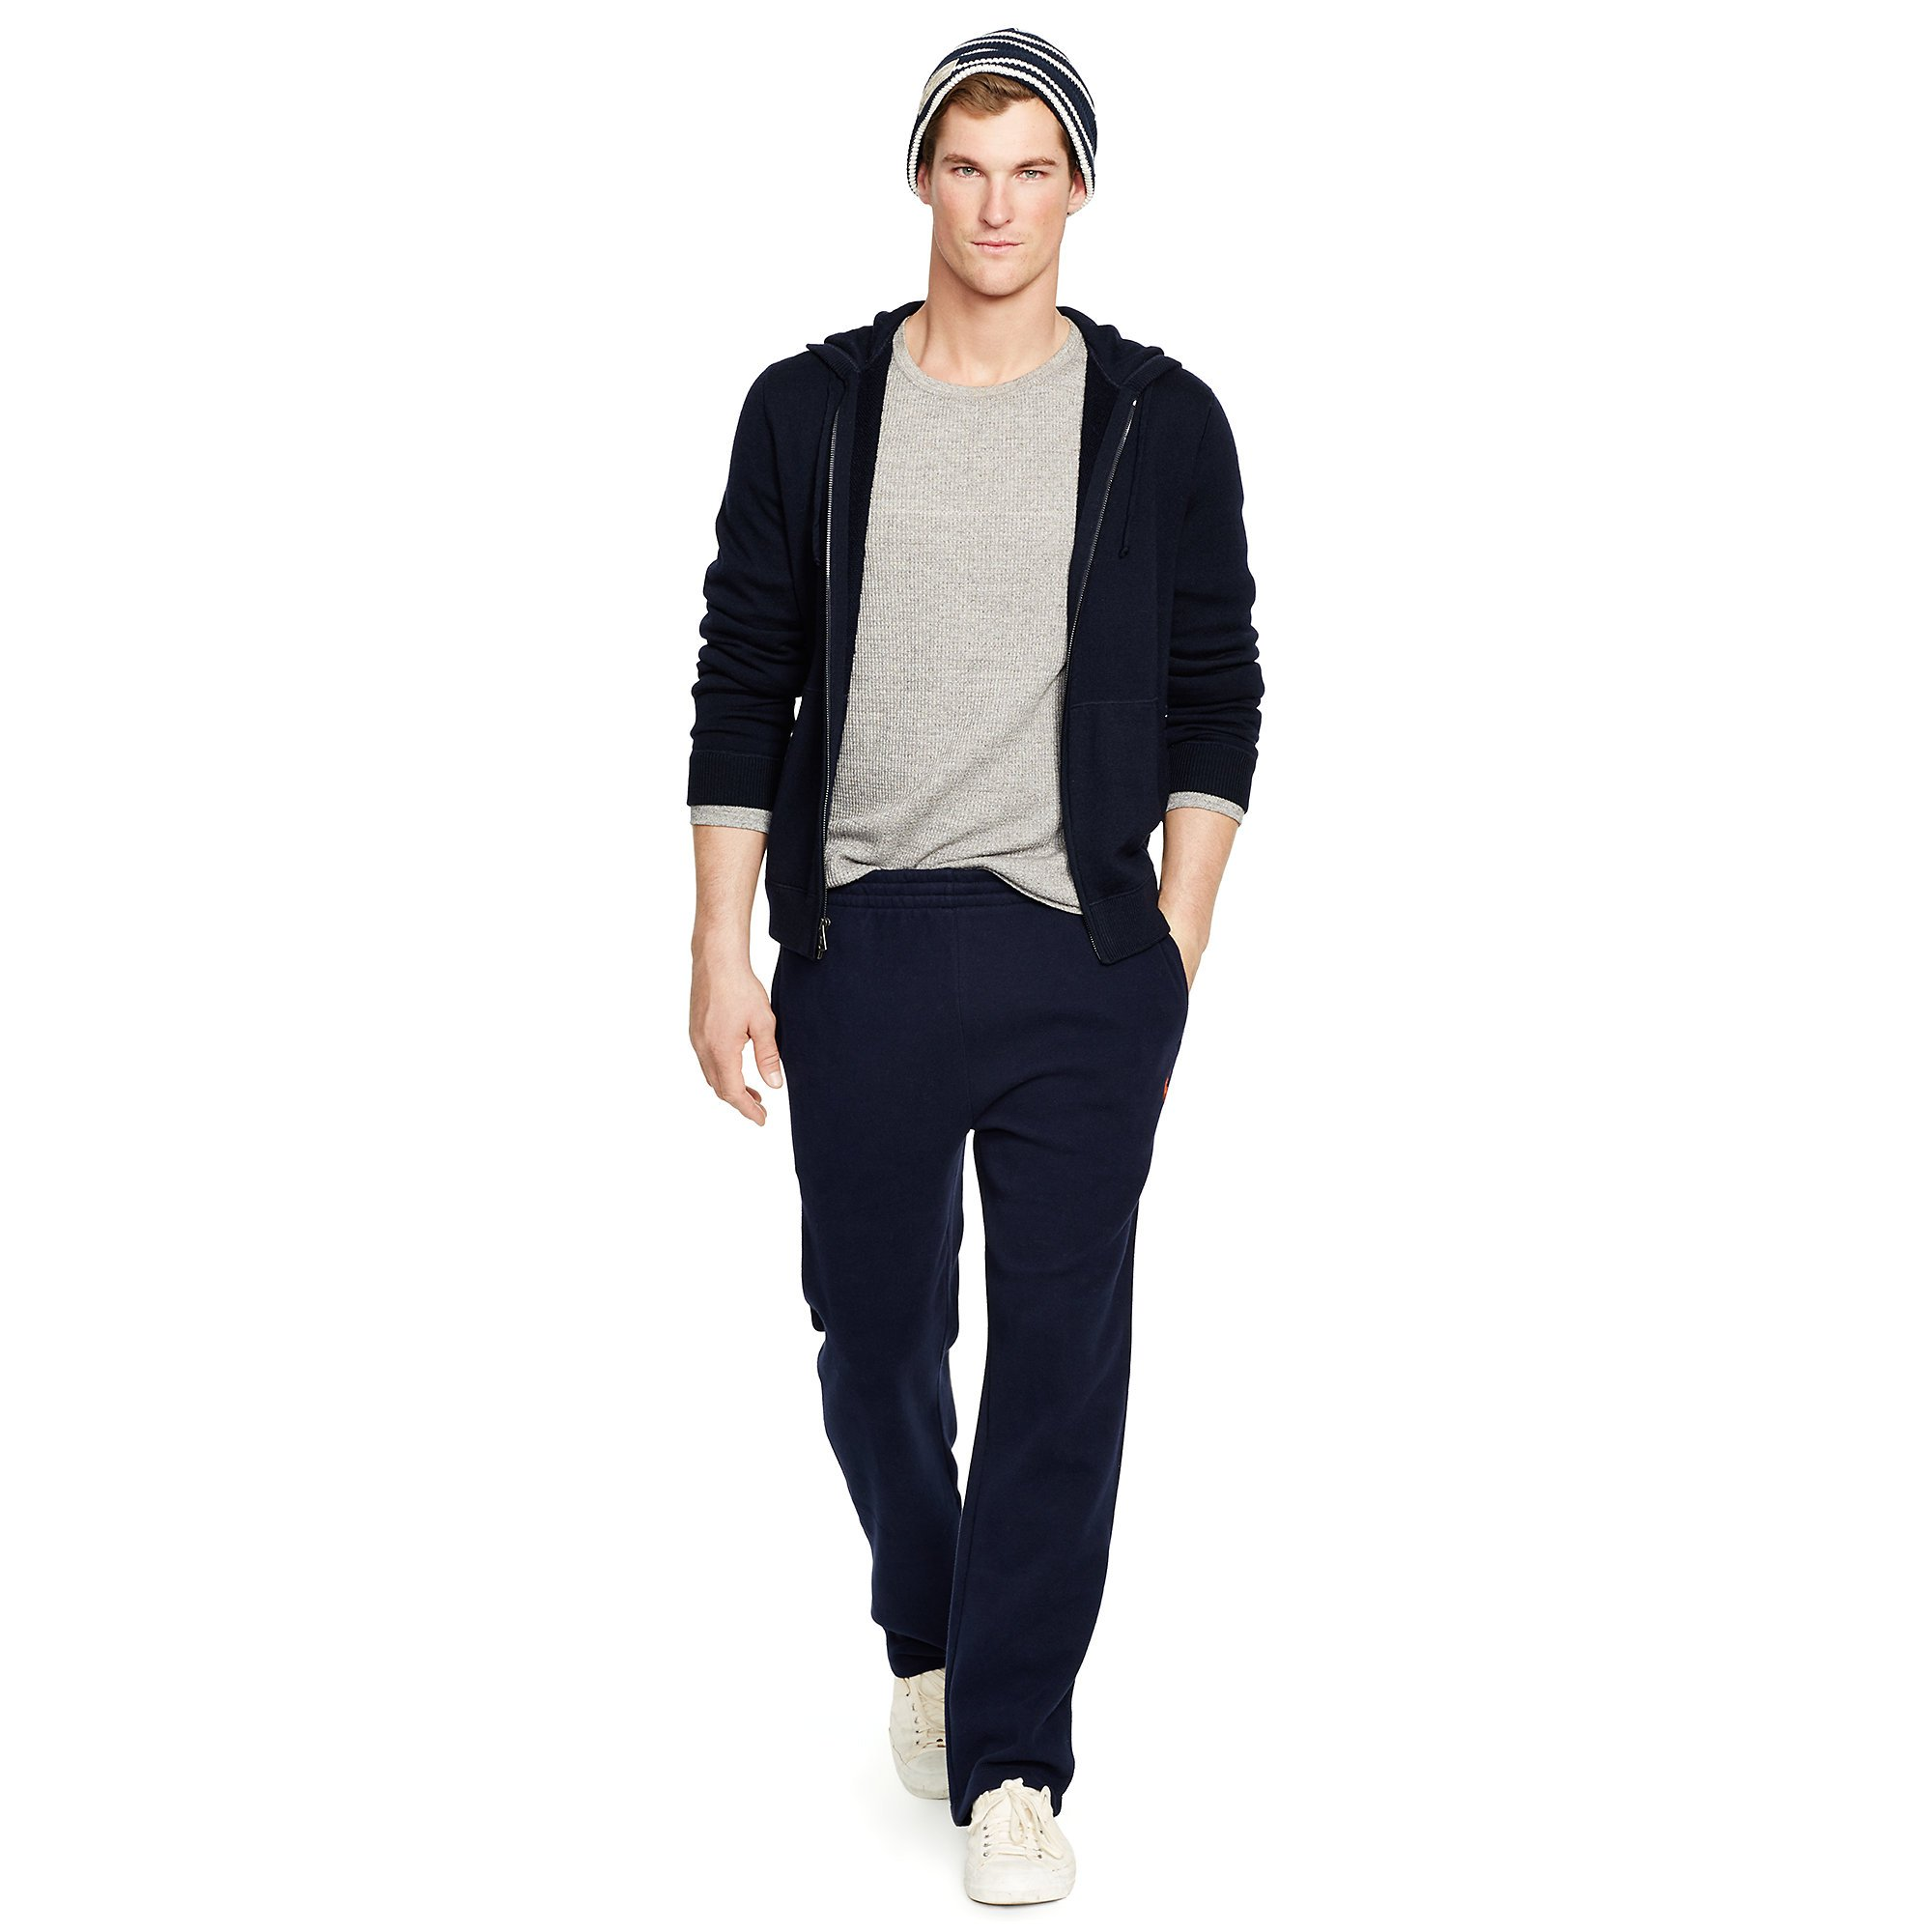 polo ralph lauren merino wool full zip hoodie in blue for. Black Bedroom Furniture Sets. Home Design Ideas